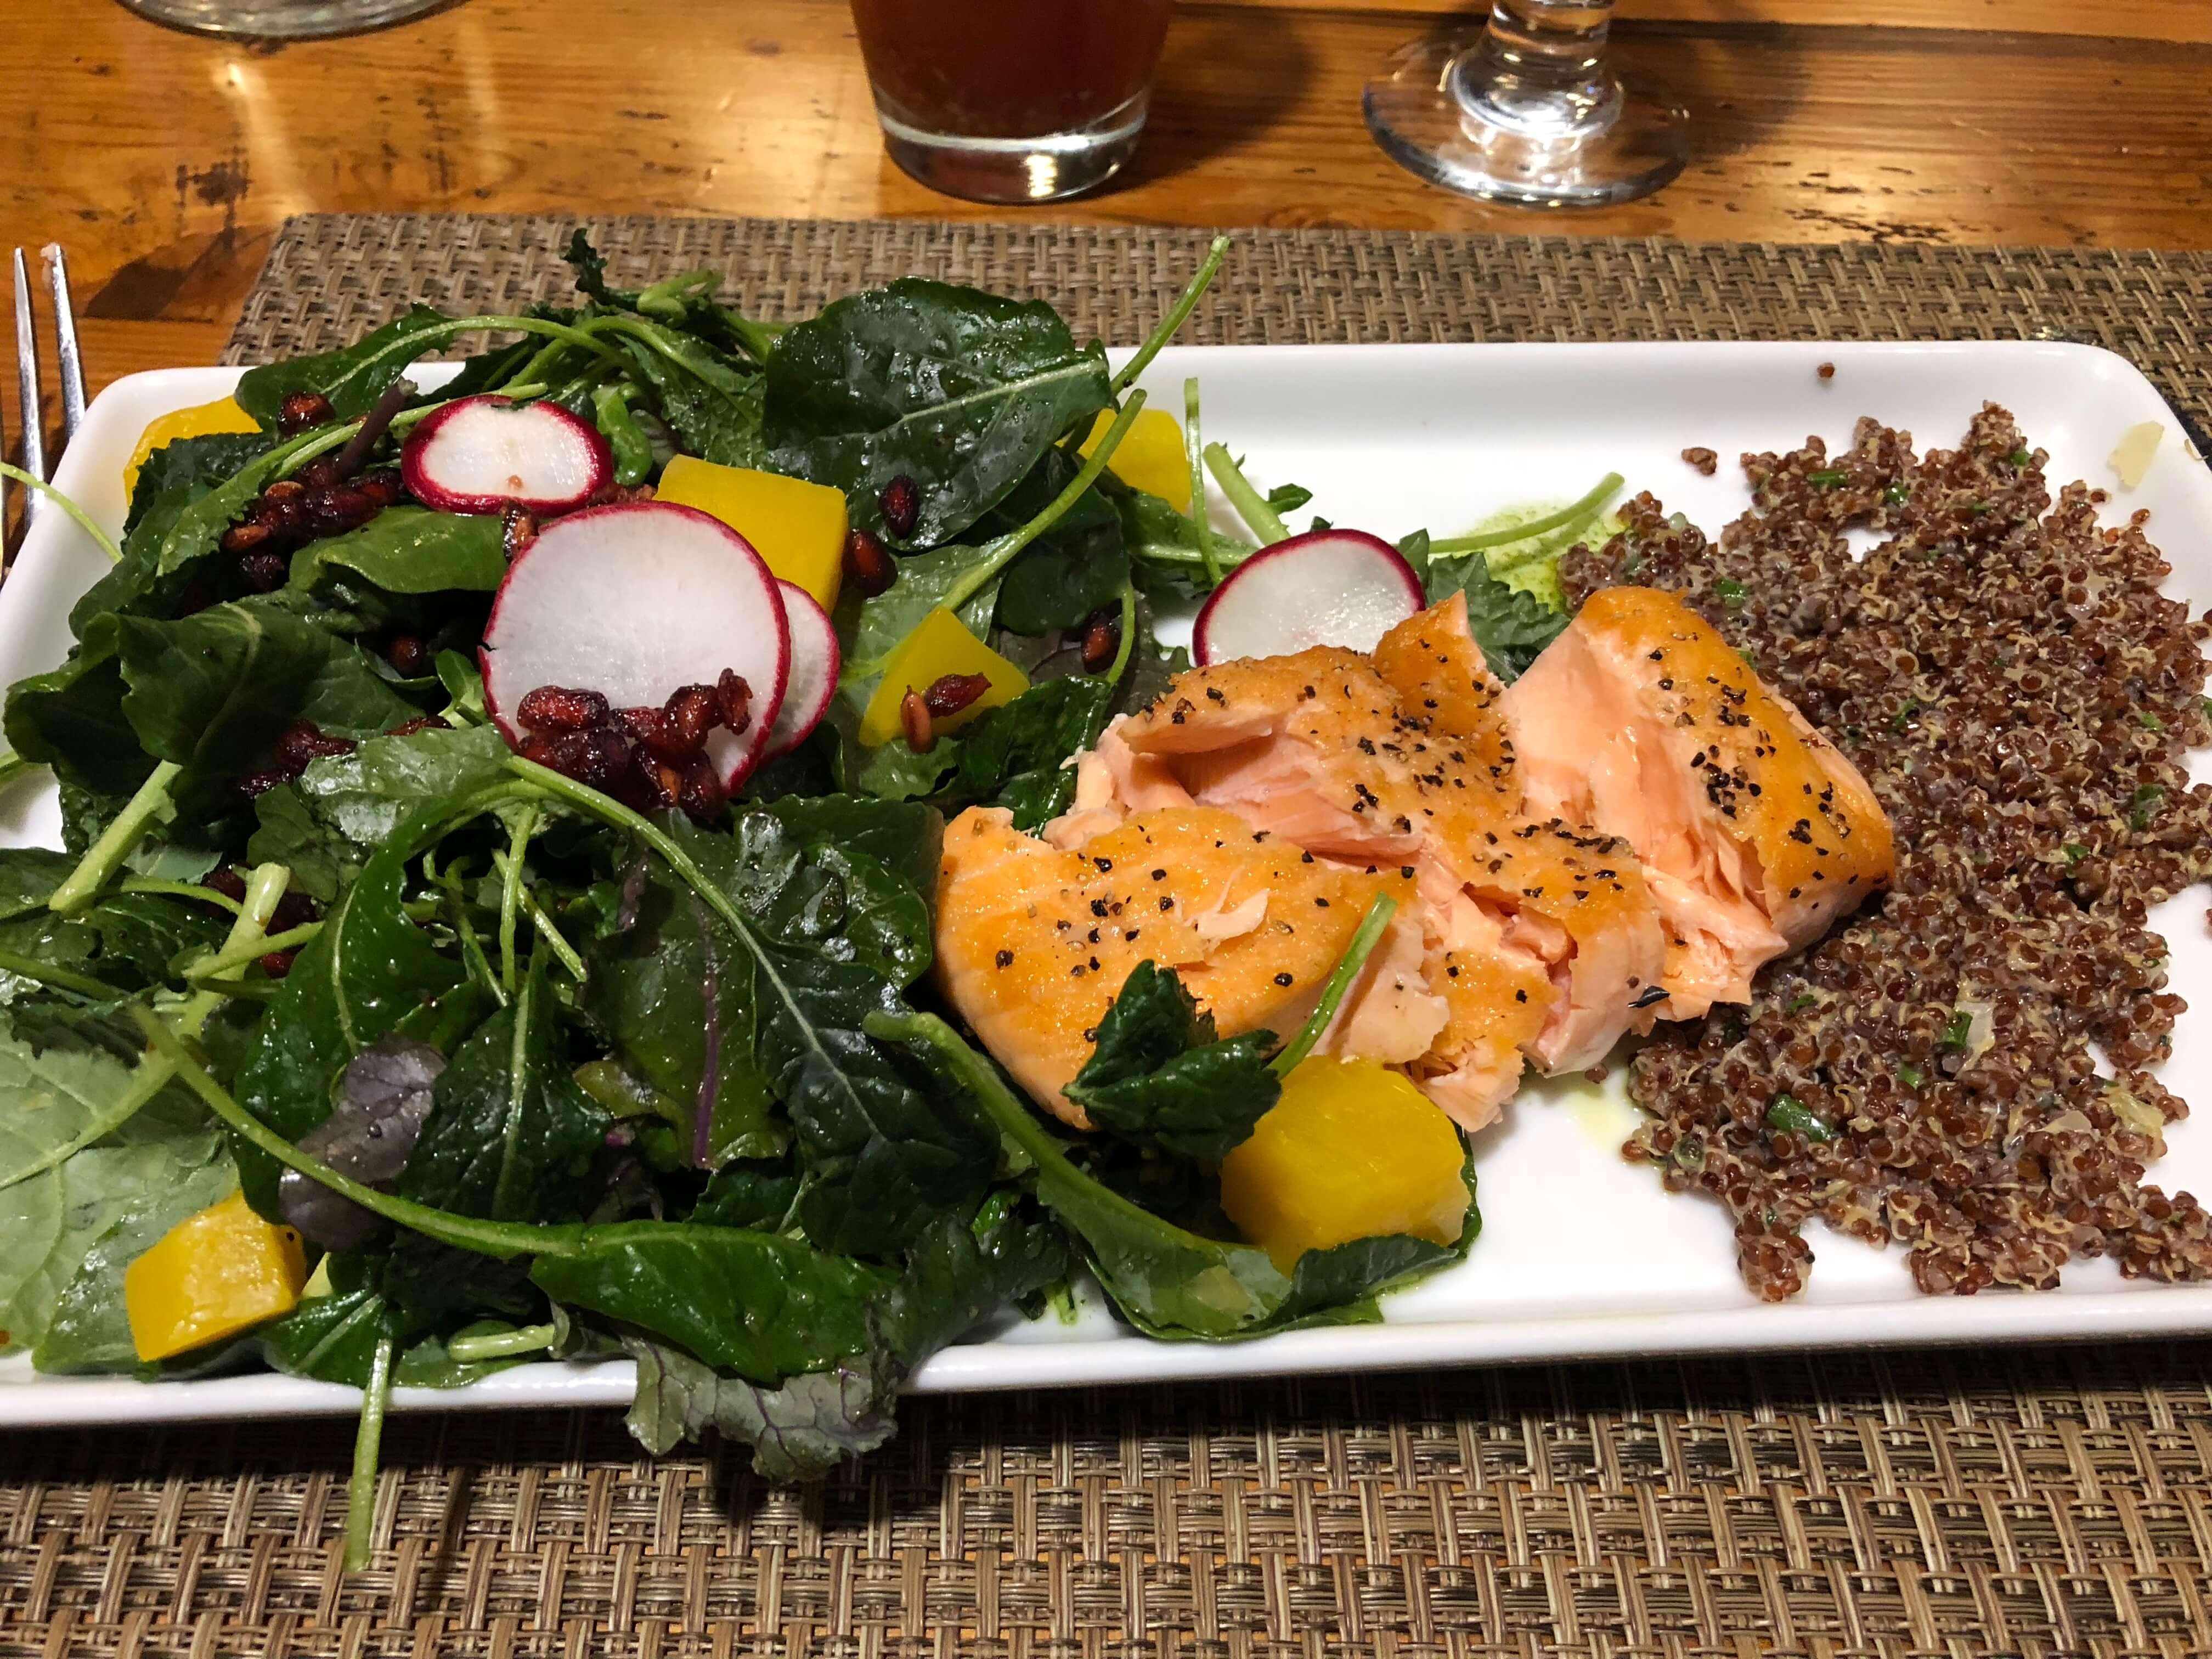 Killington Resort learn to ski program delicious salmon